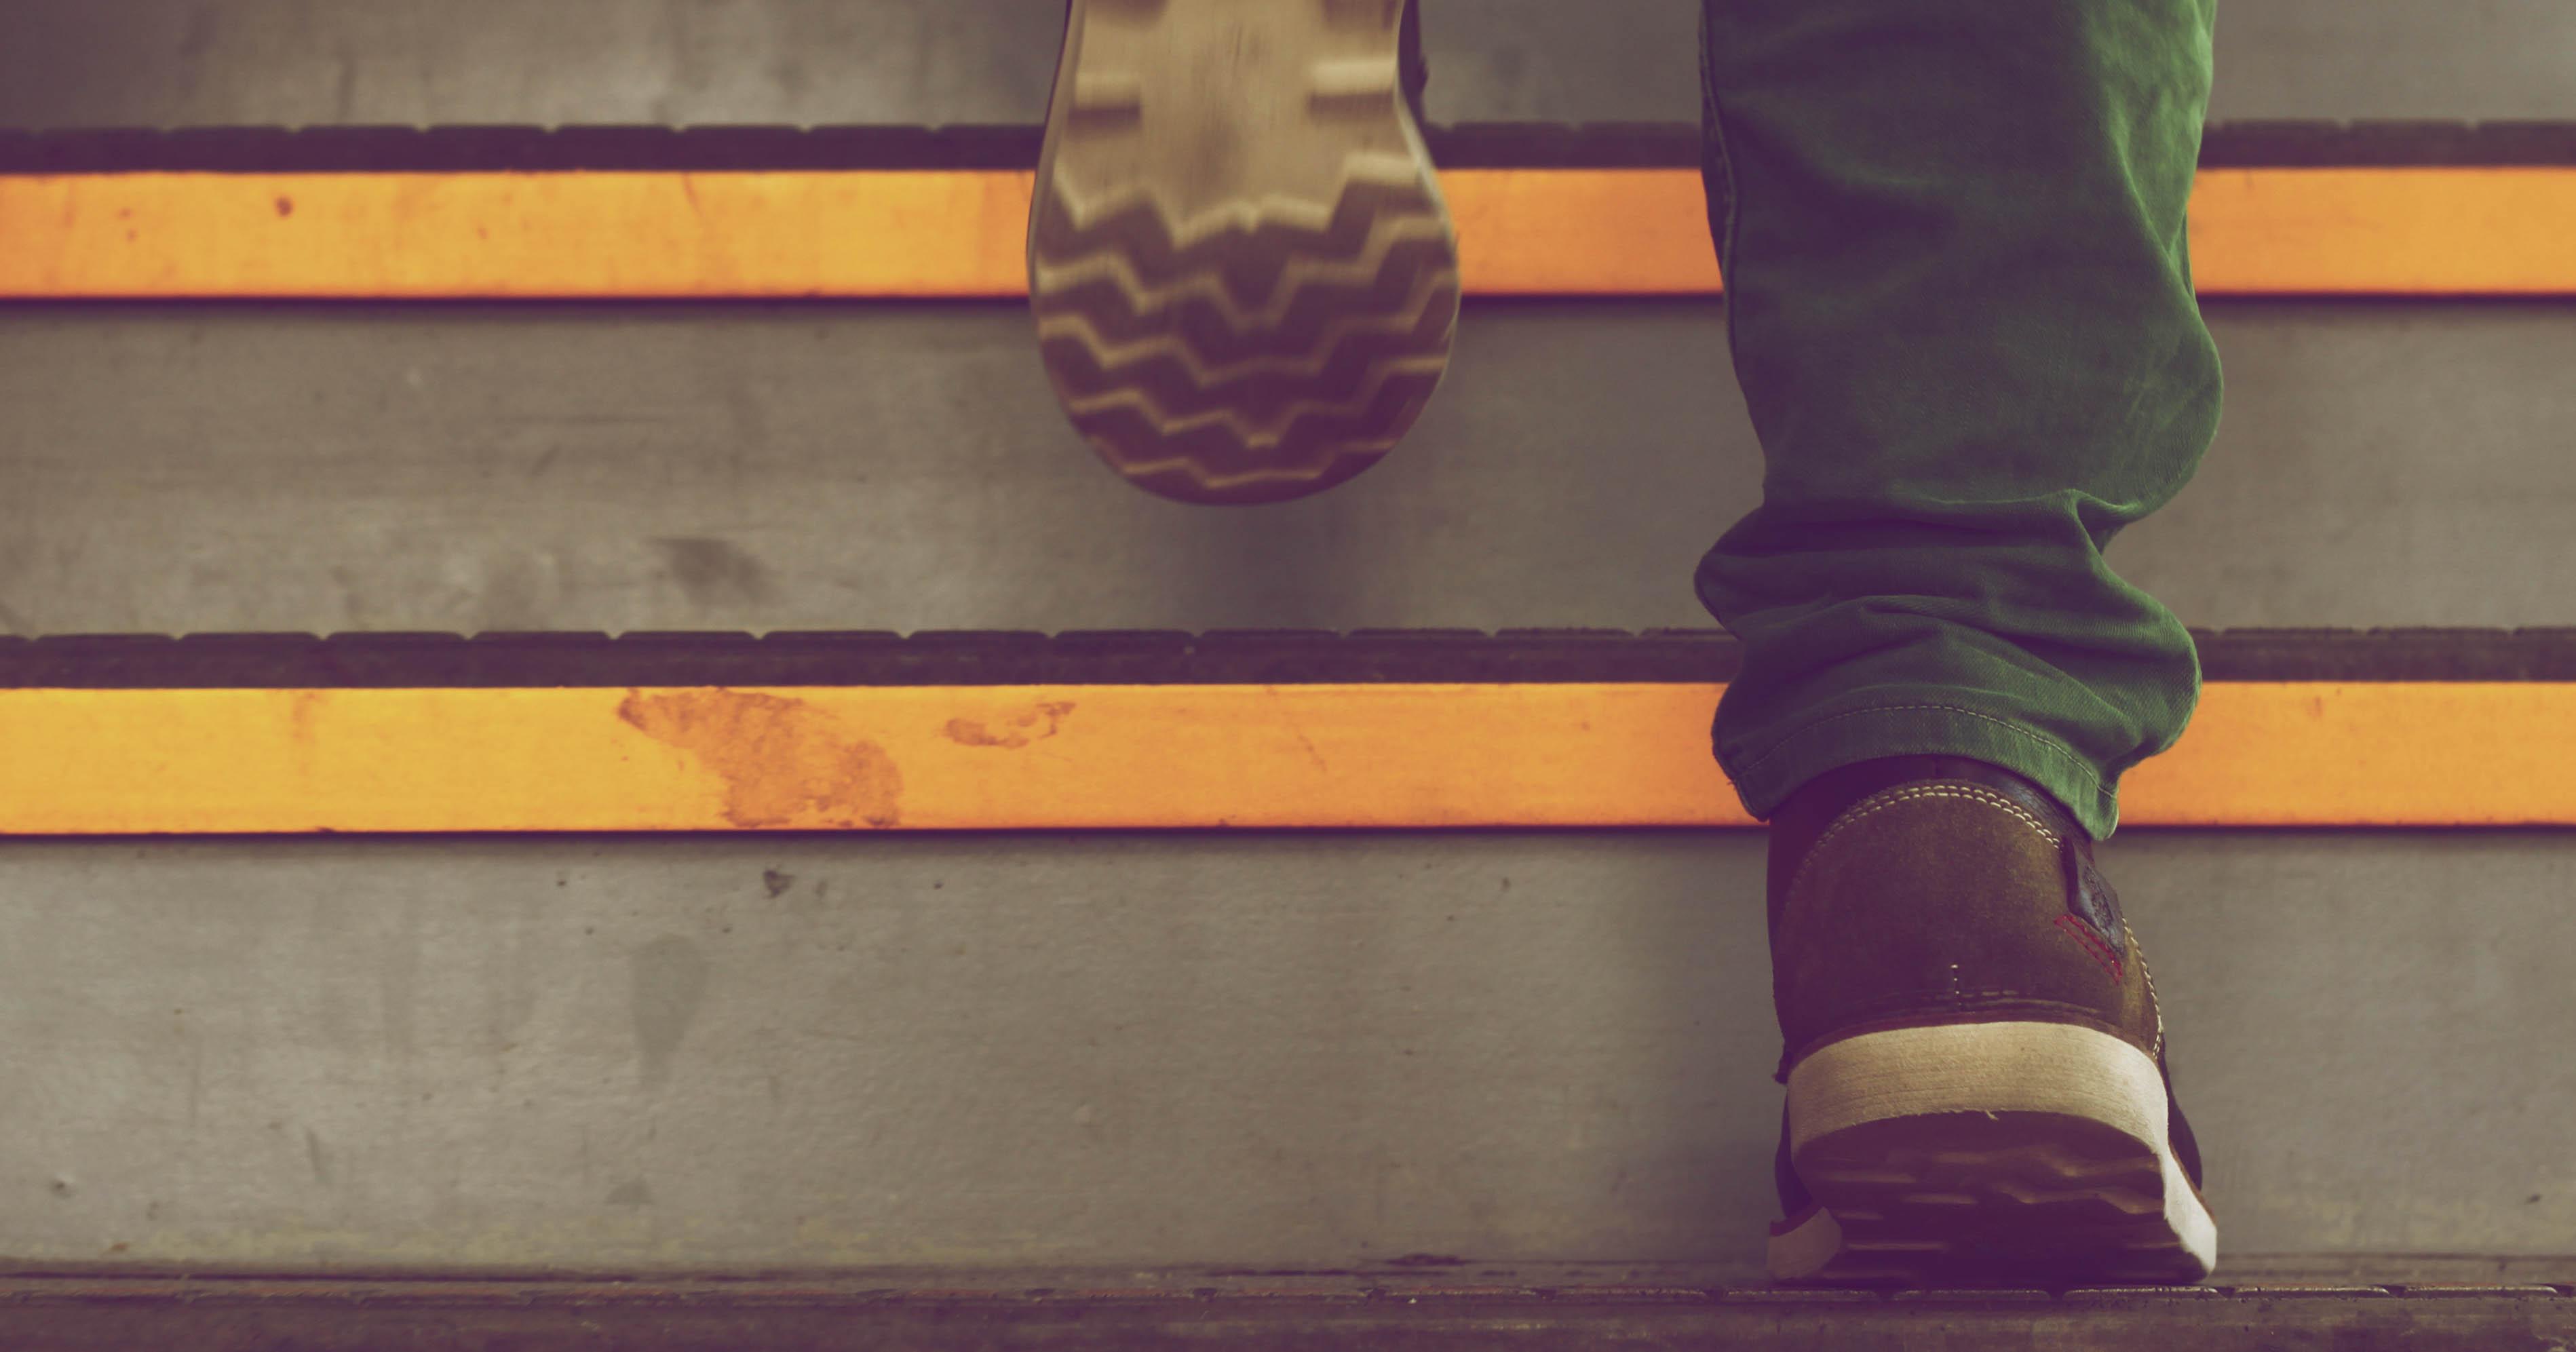 Step-up-1170x614